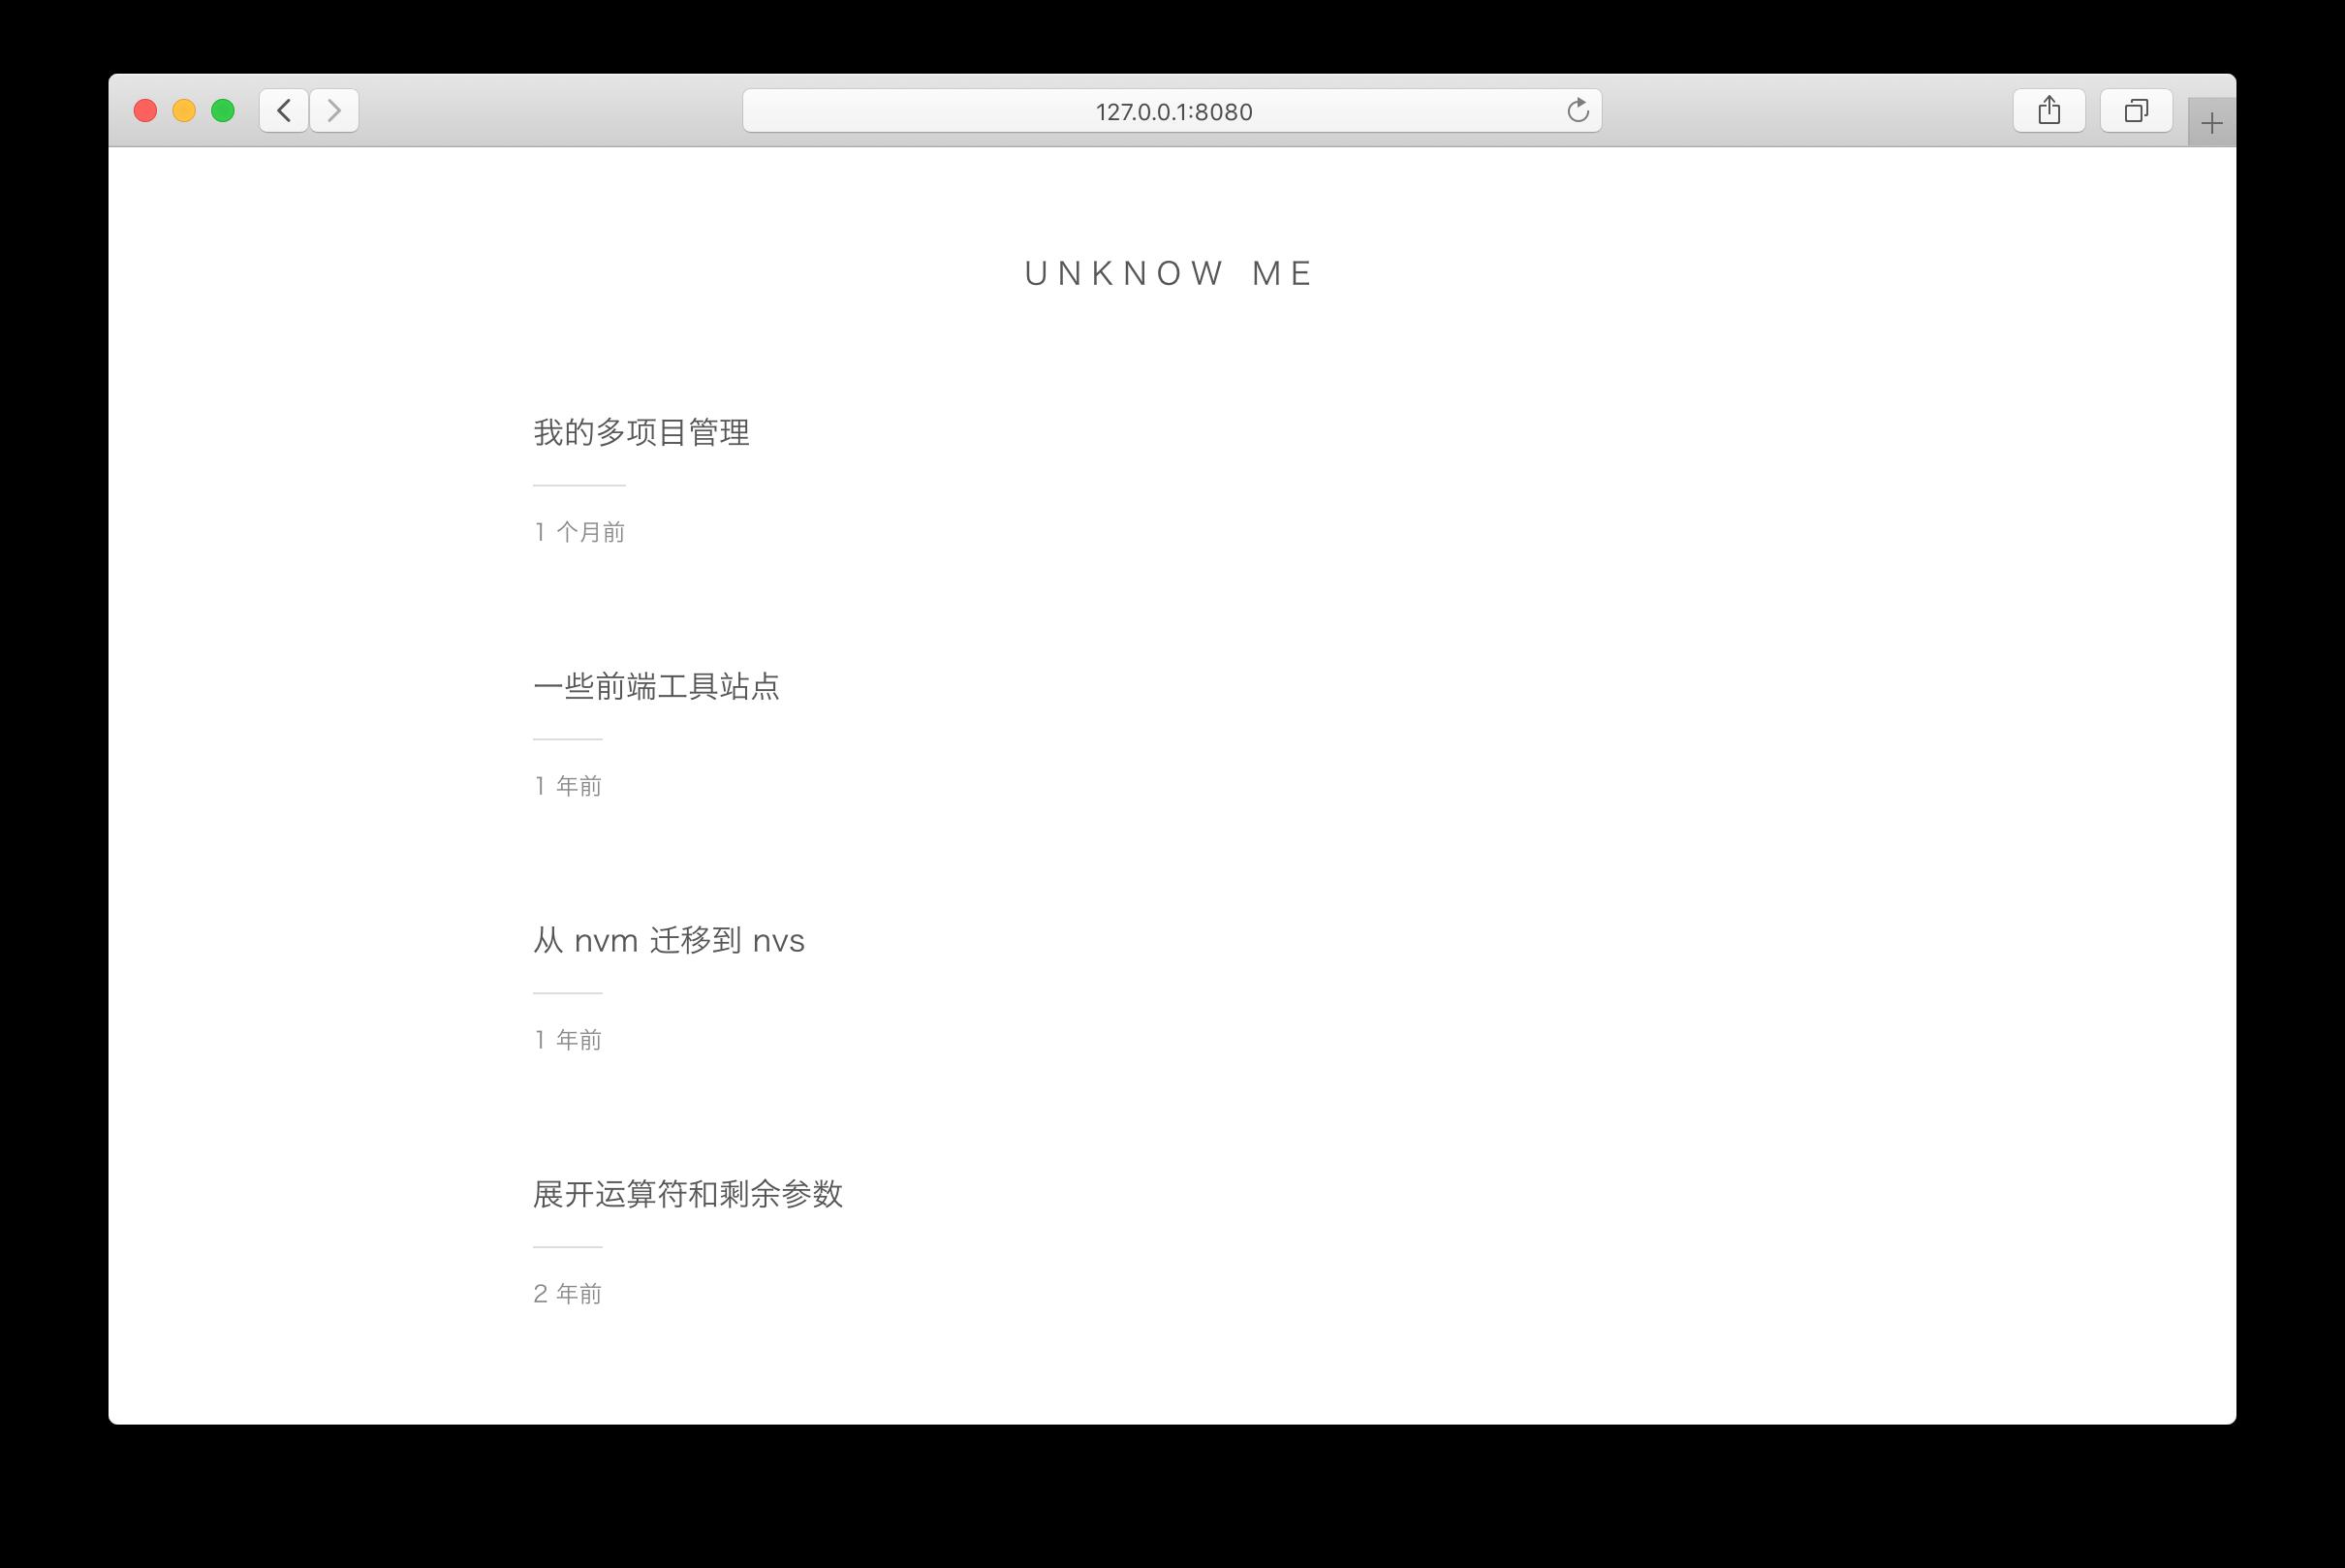 GitHub - viko16/vuepress-theme-simple: ✏️ Very Simple Blog